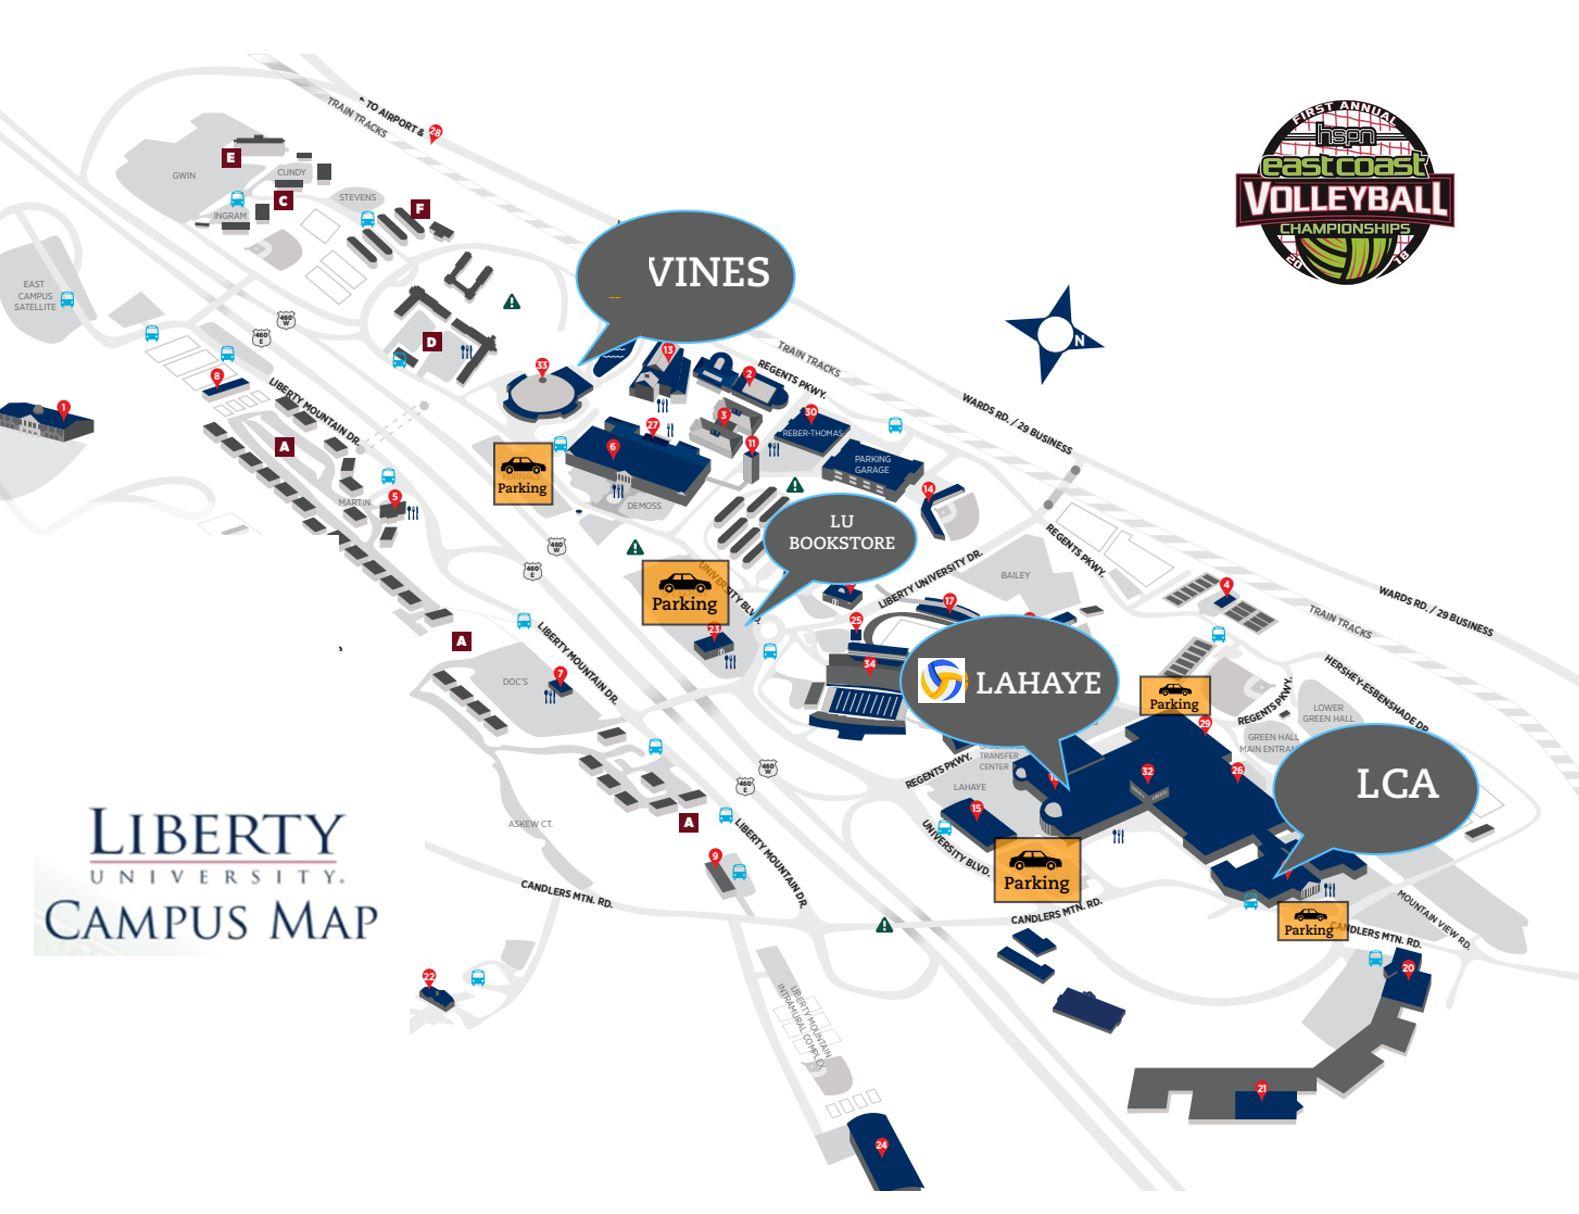 2018 East Coast Homeschool Volleyball Nationals Liberty University Campus Map